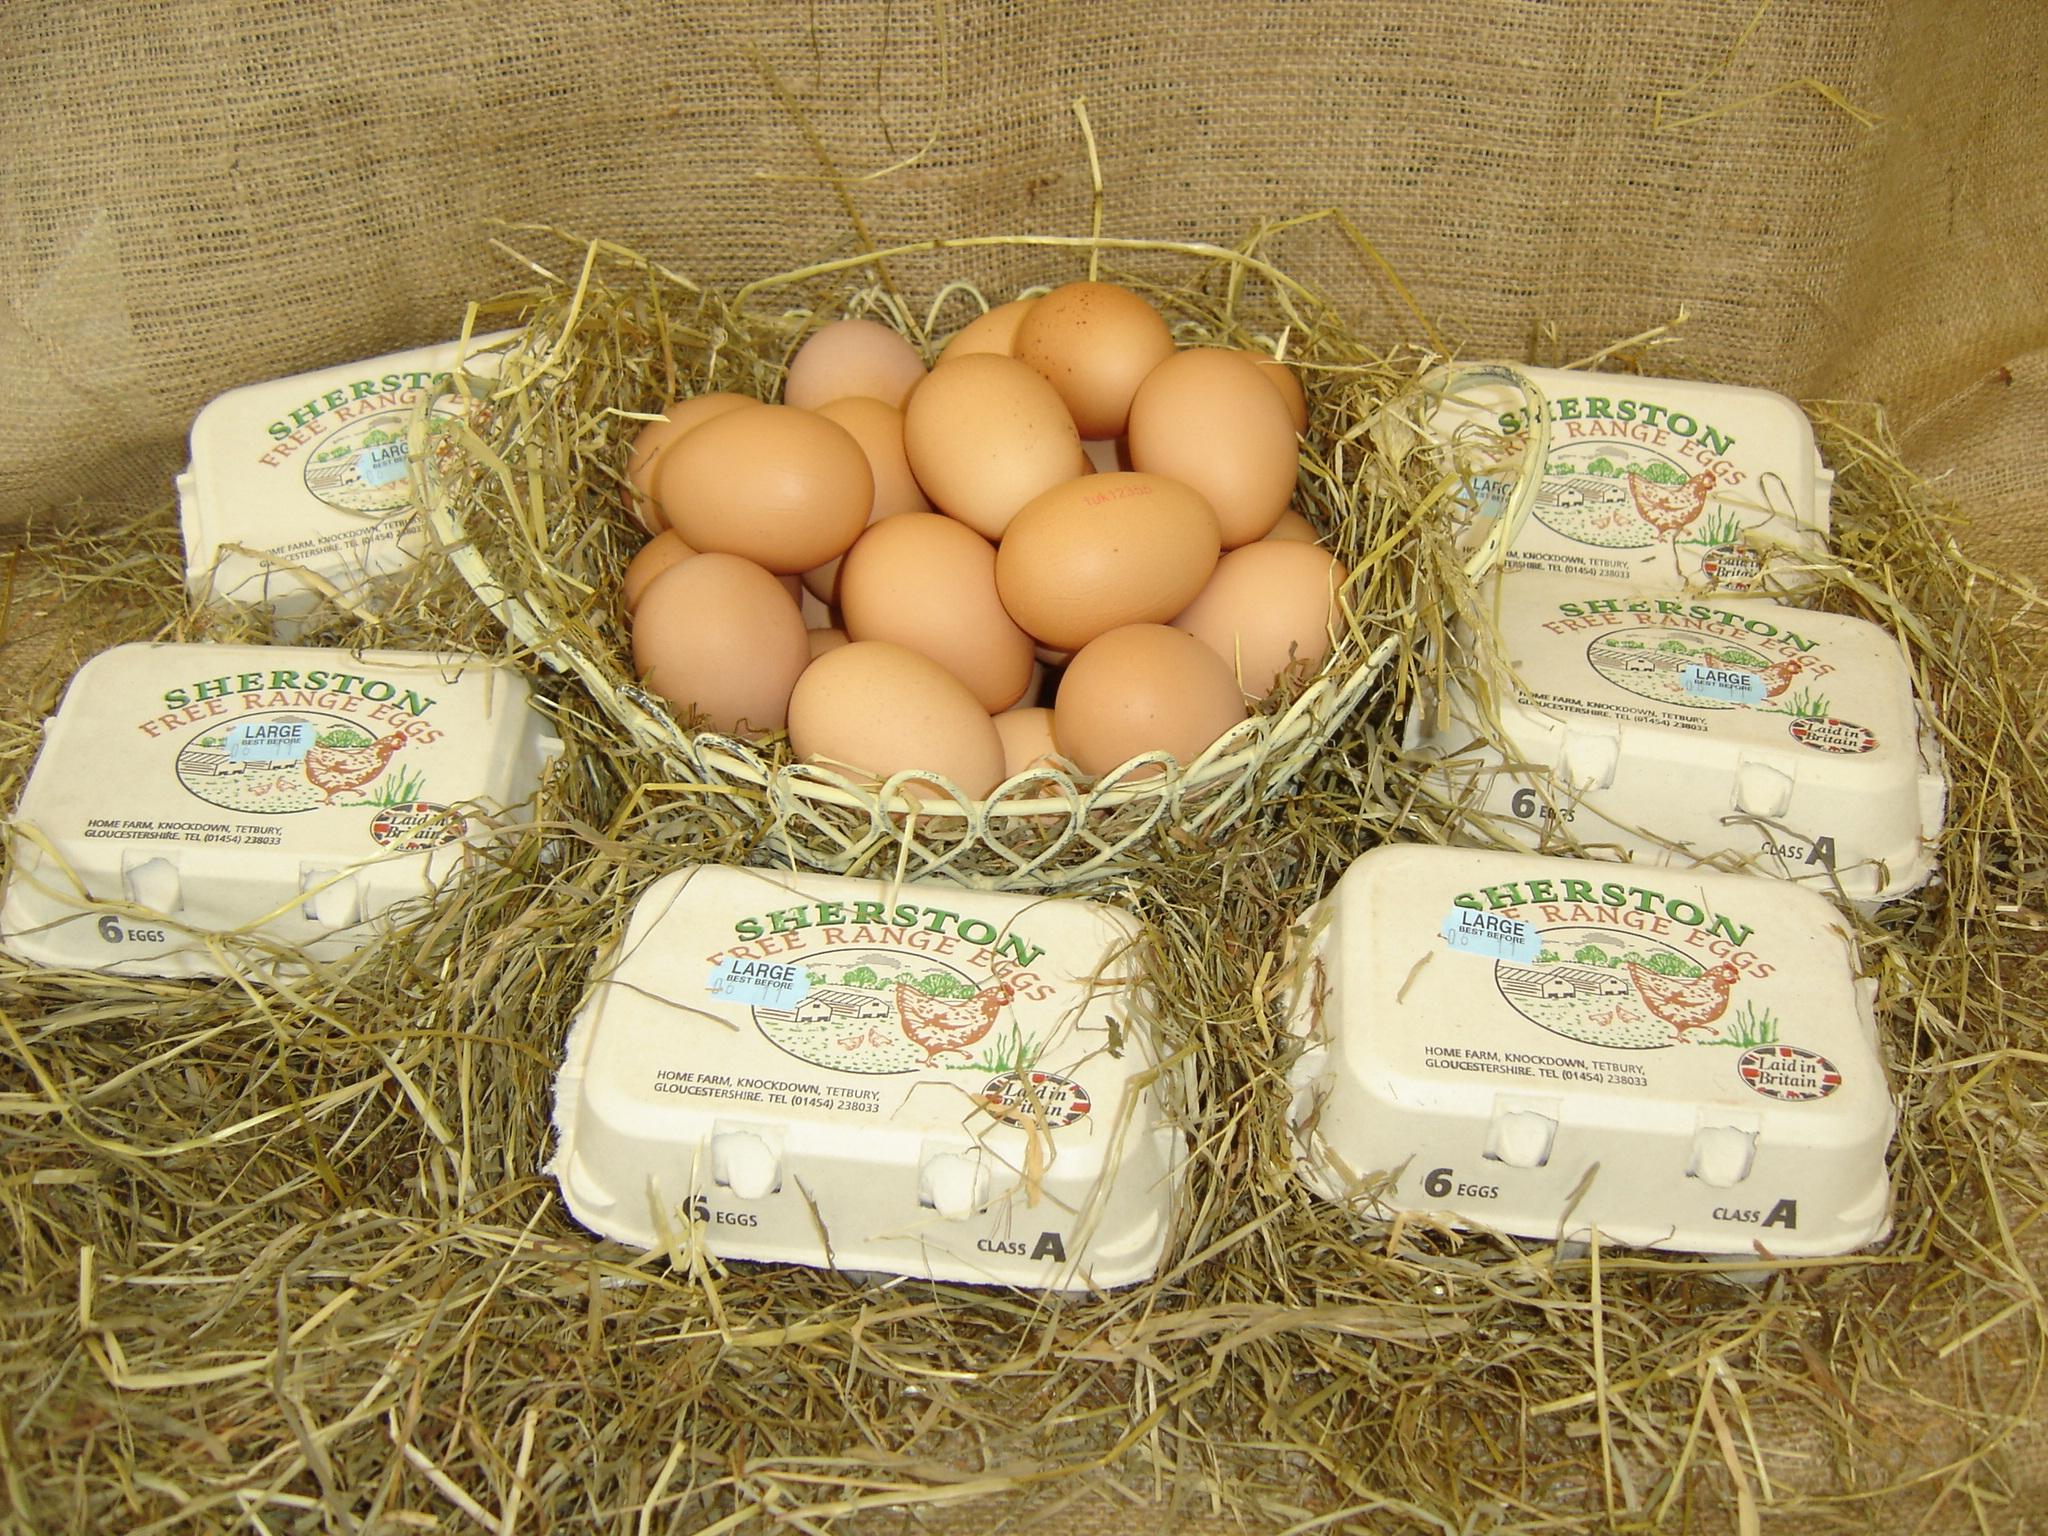 Sherston Free Range Eggs